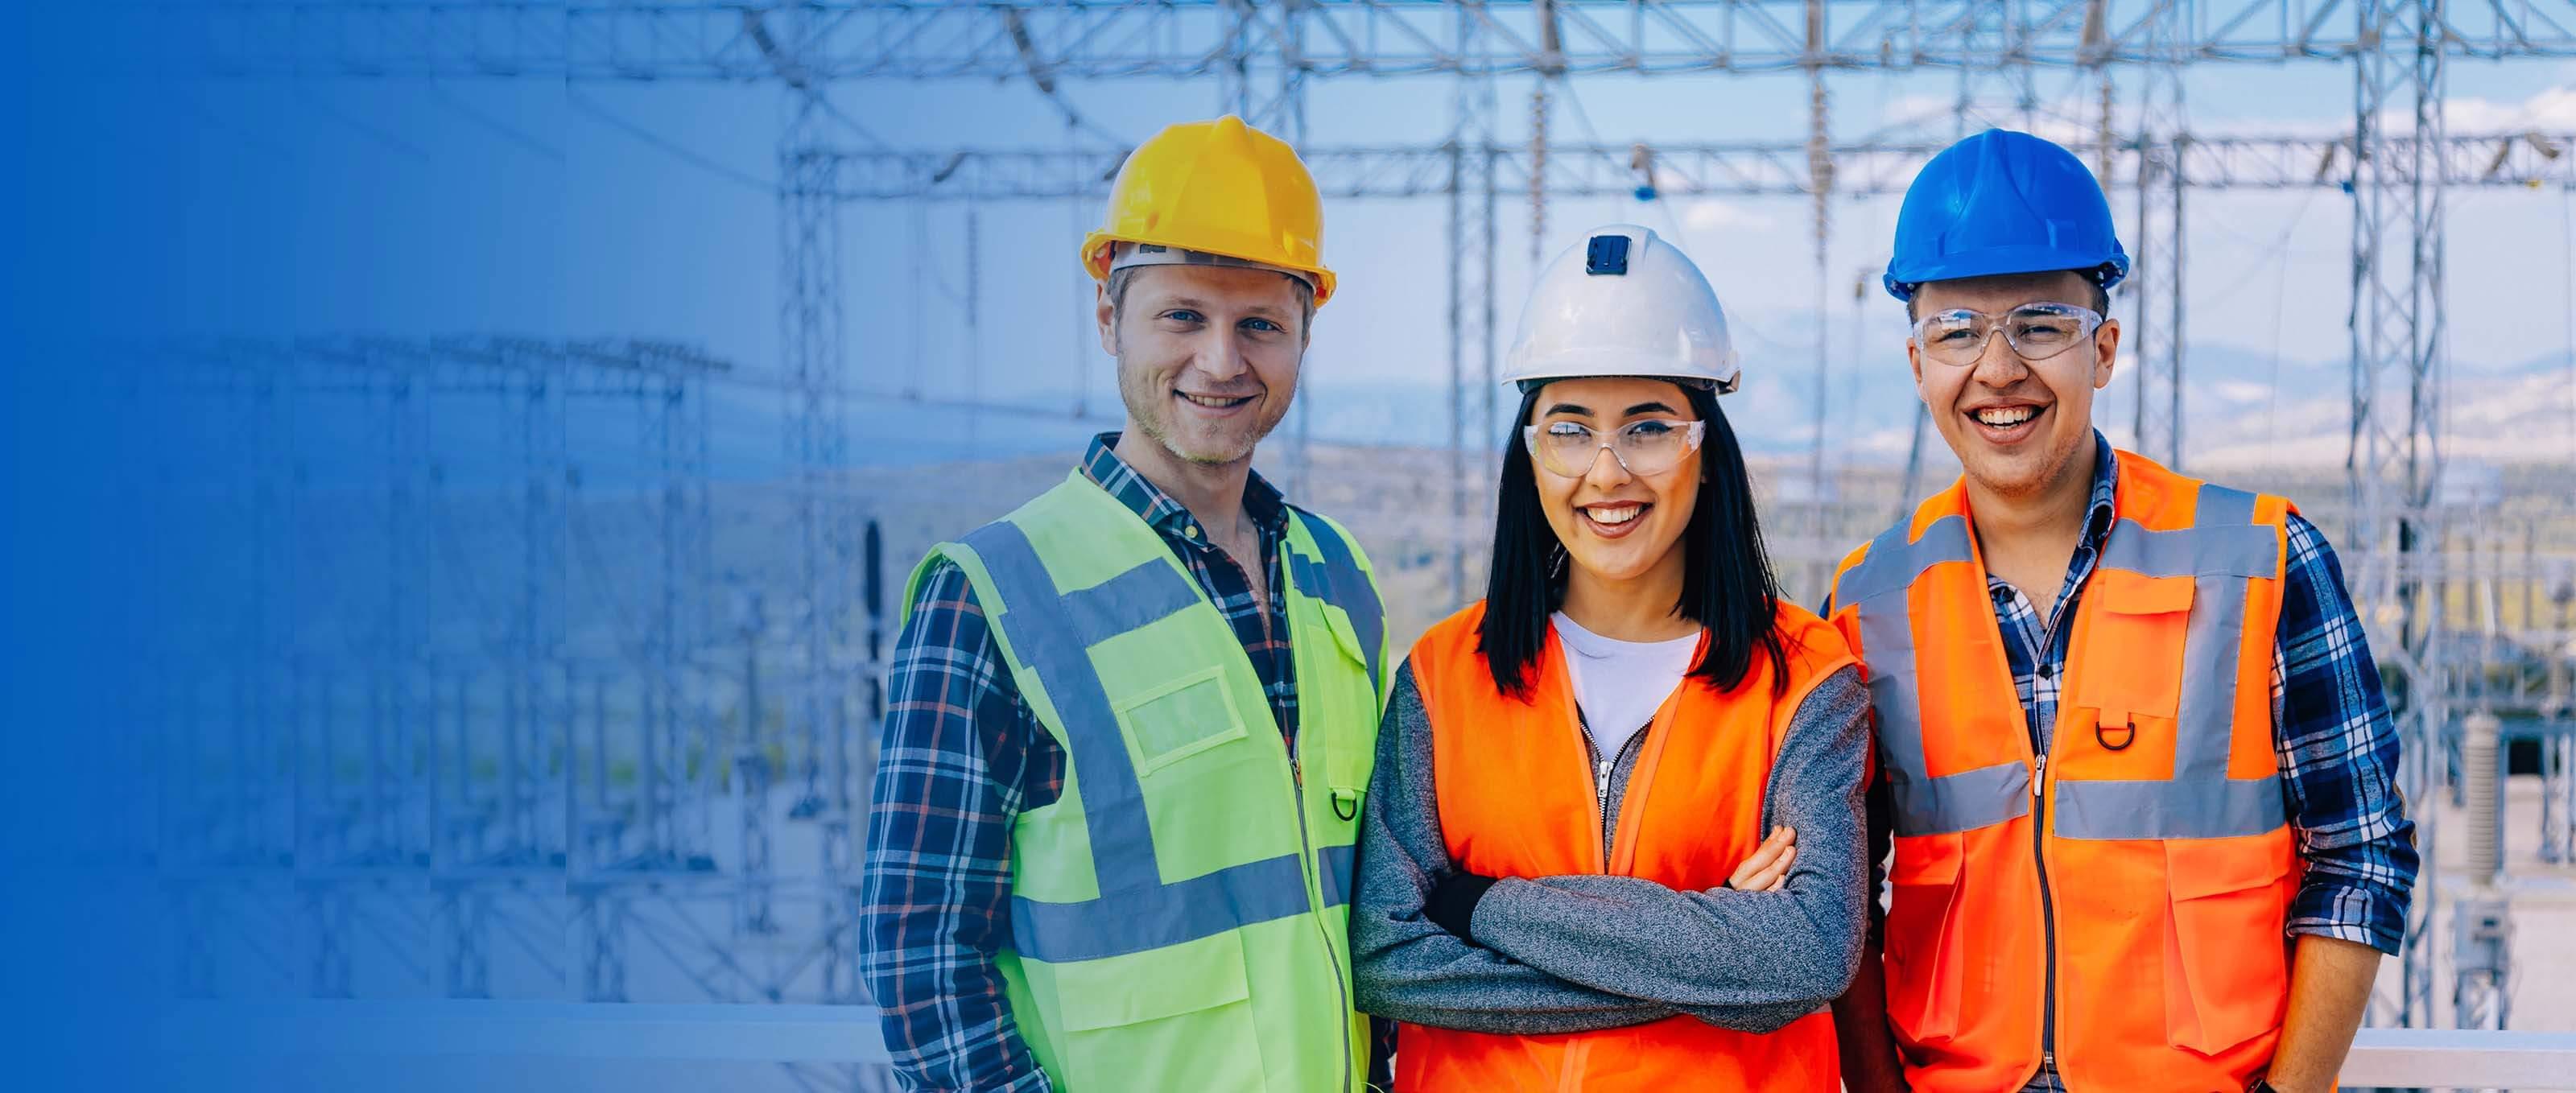 Engineers at power company | GE Digital Energy